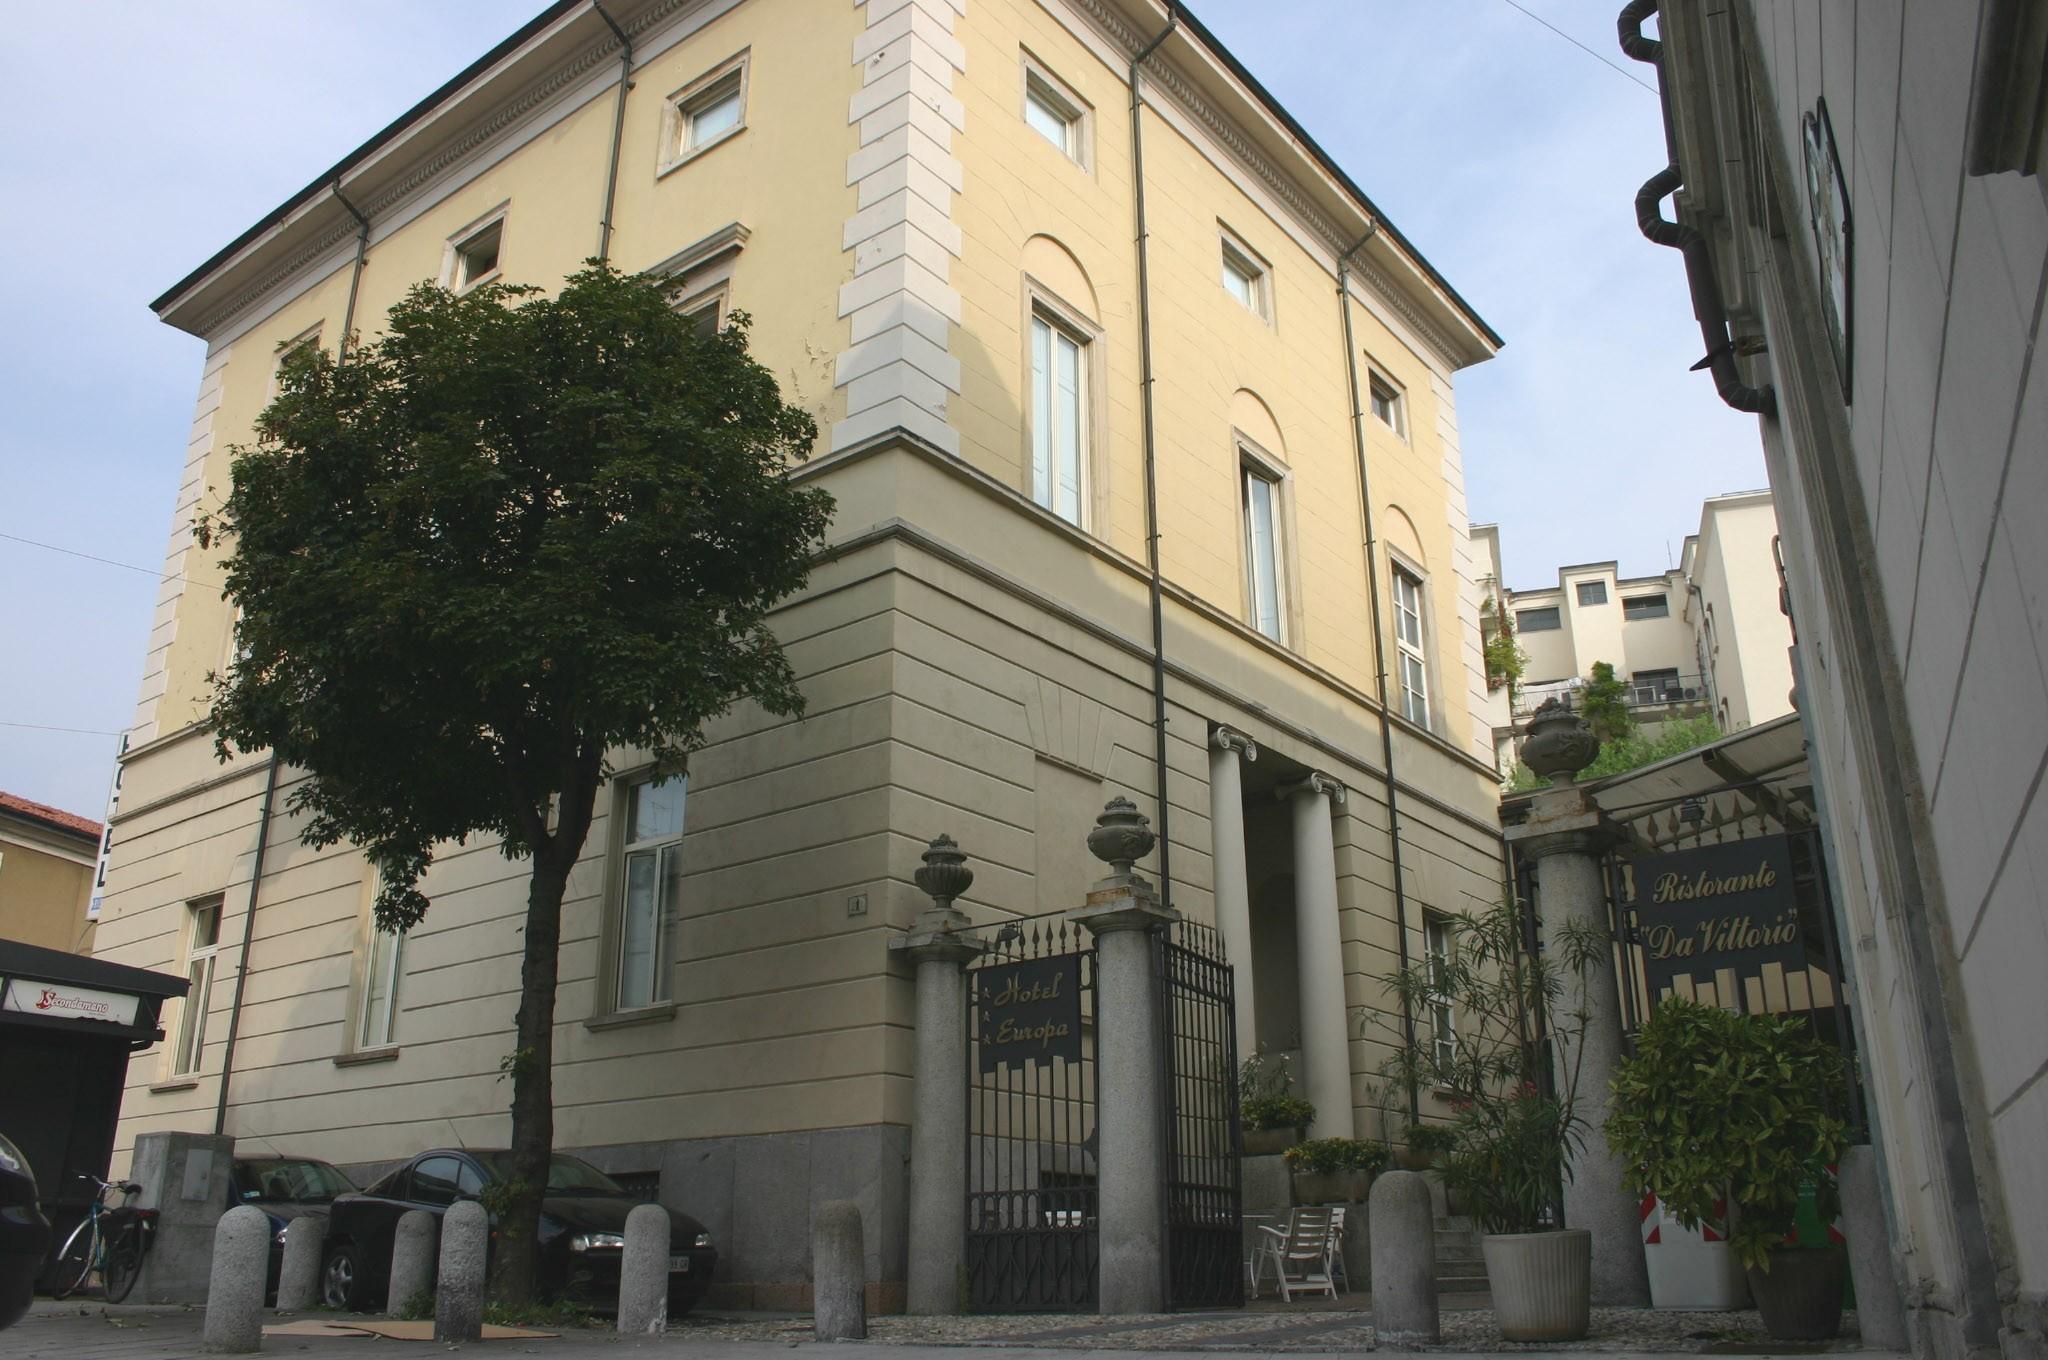 Ascomvillage hotel europa piazza beccaria 1 varese for Piazza beccaria